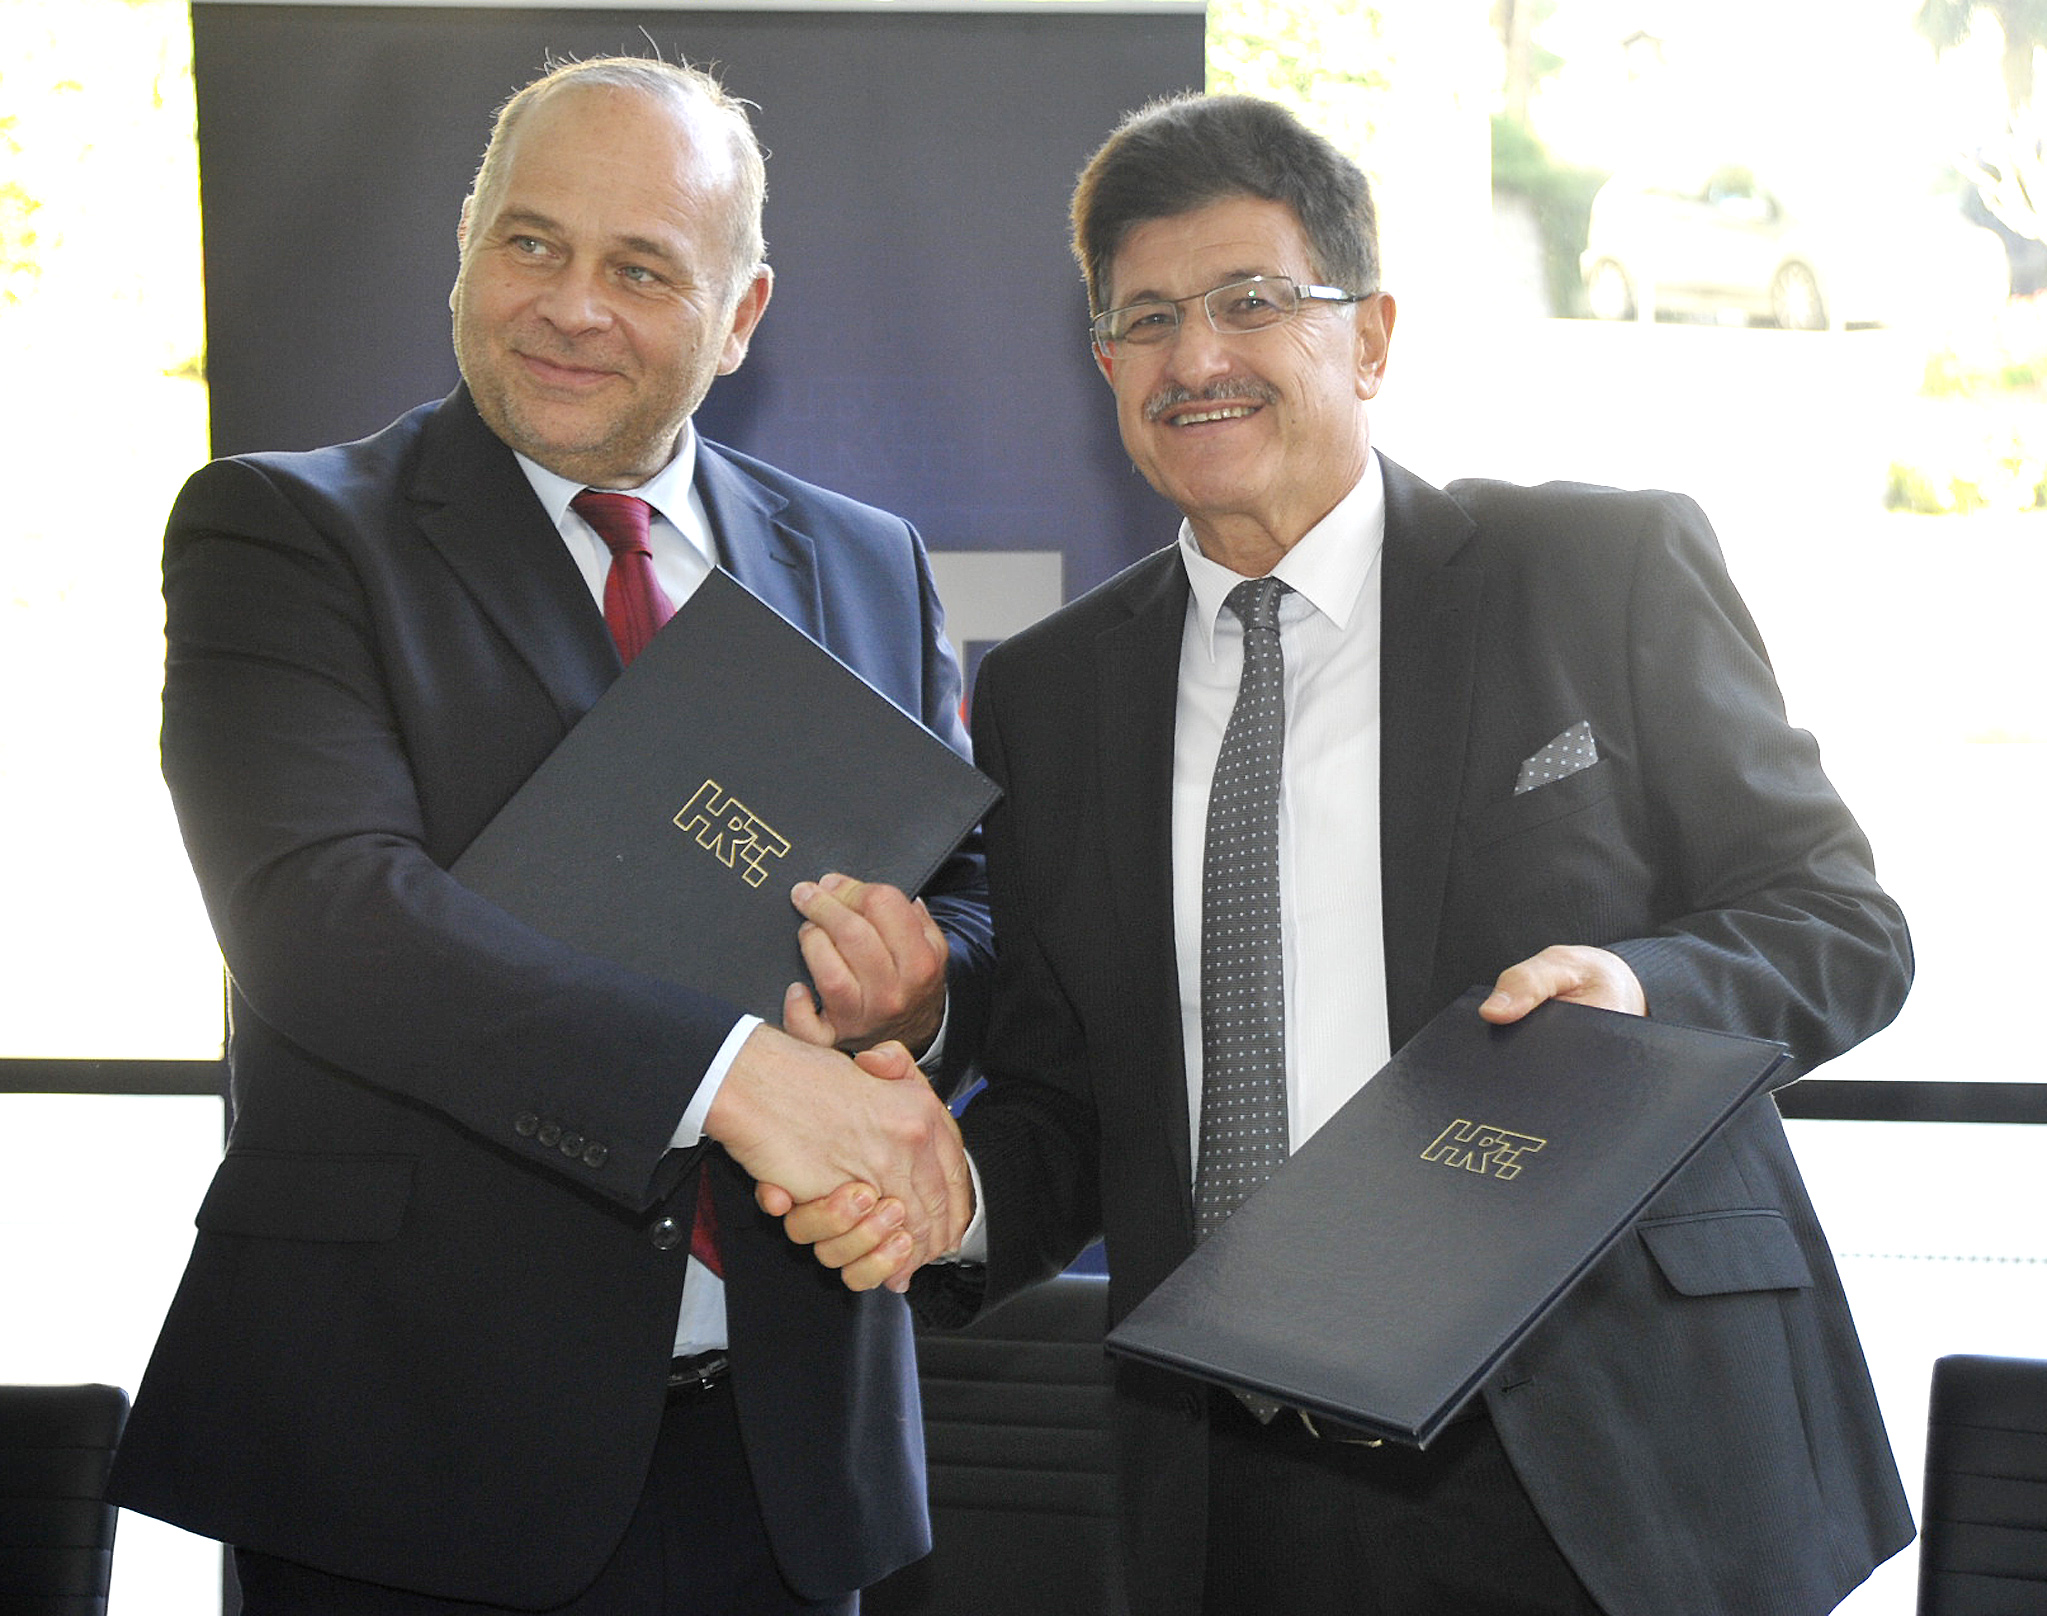 Potpis na ugovor o Dori u Opatiji - ravnatelj HRT-a Kazimir Bačić i opatijski gradonačelnik Ivo Dujmić / Snimio Sergej DRECHSLER